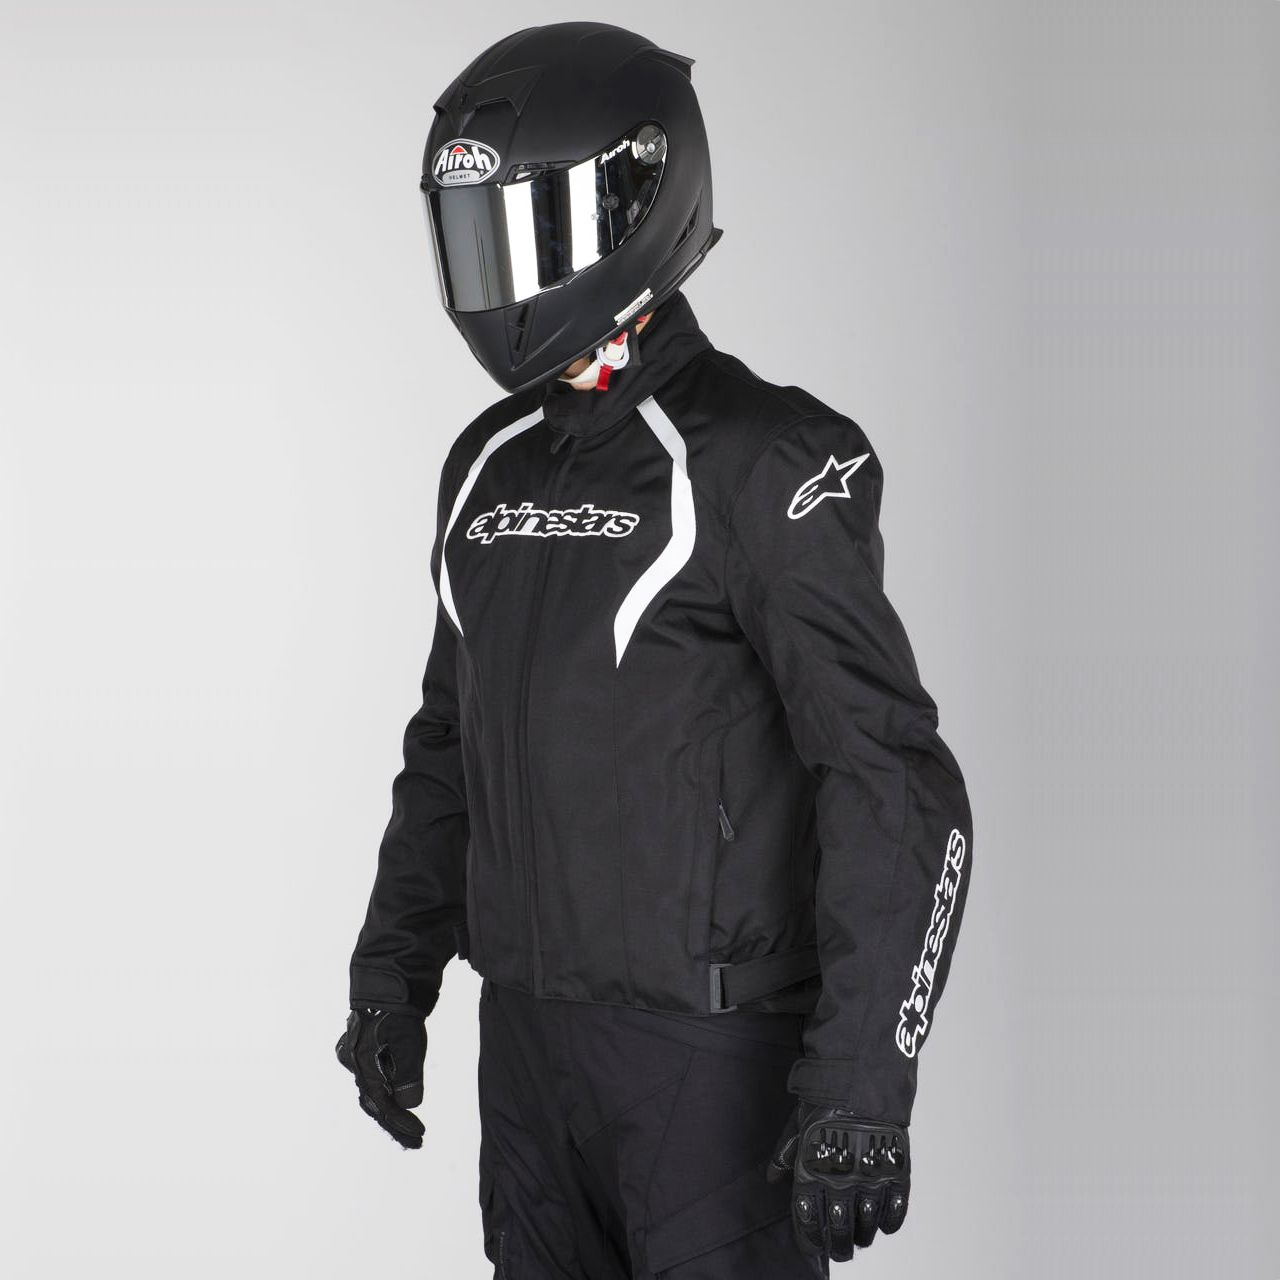 0 Jaqueta Alpinestars Fastback WP (Black and White/ Impermeável)  - Super Bike - Loja Oficial Alpinestars